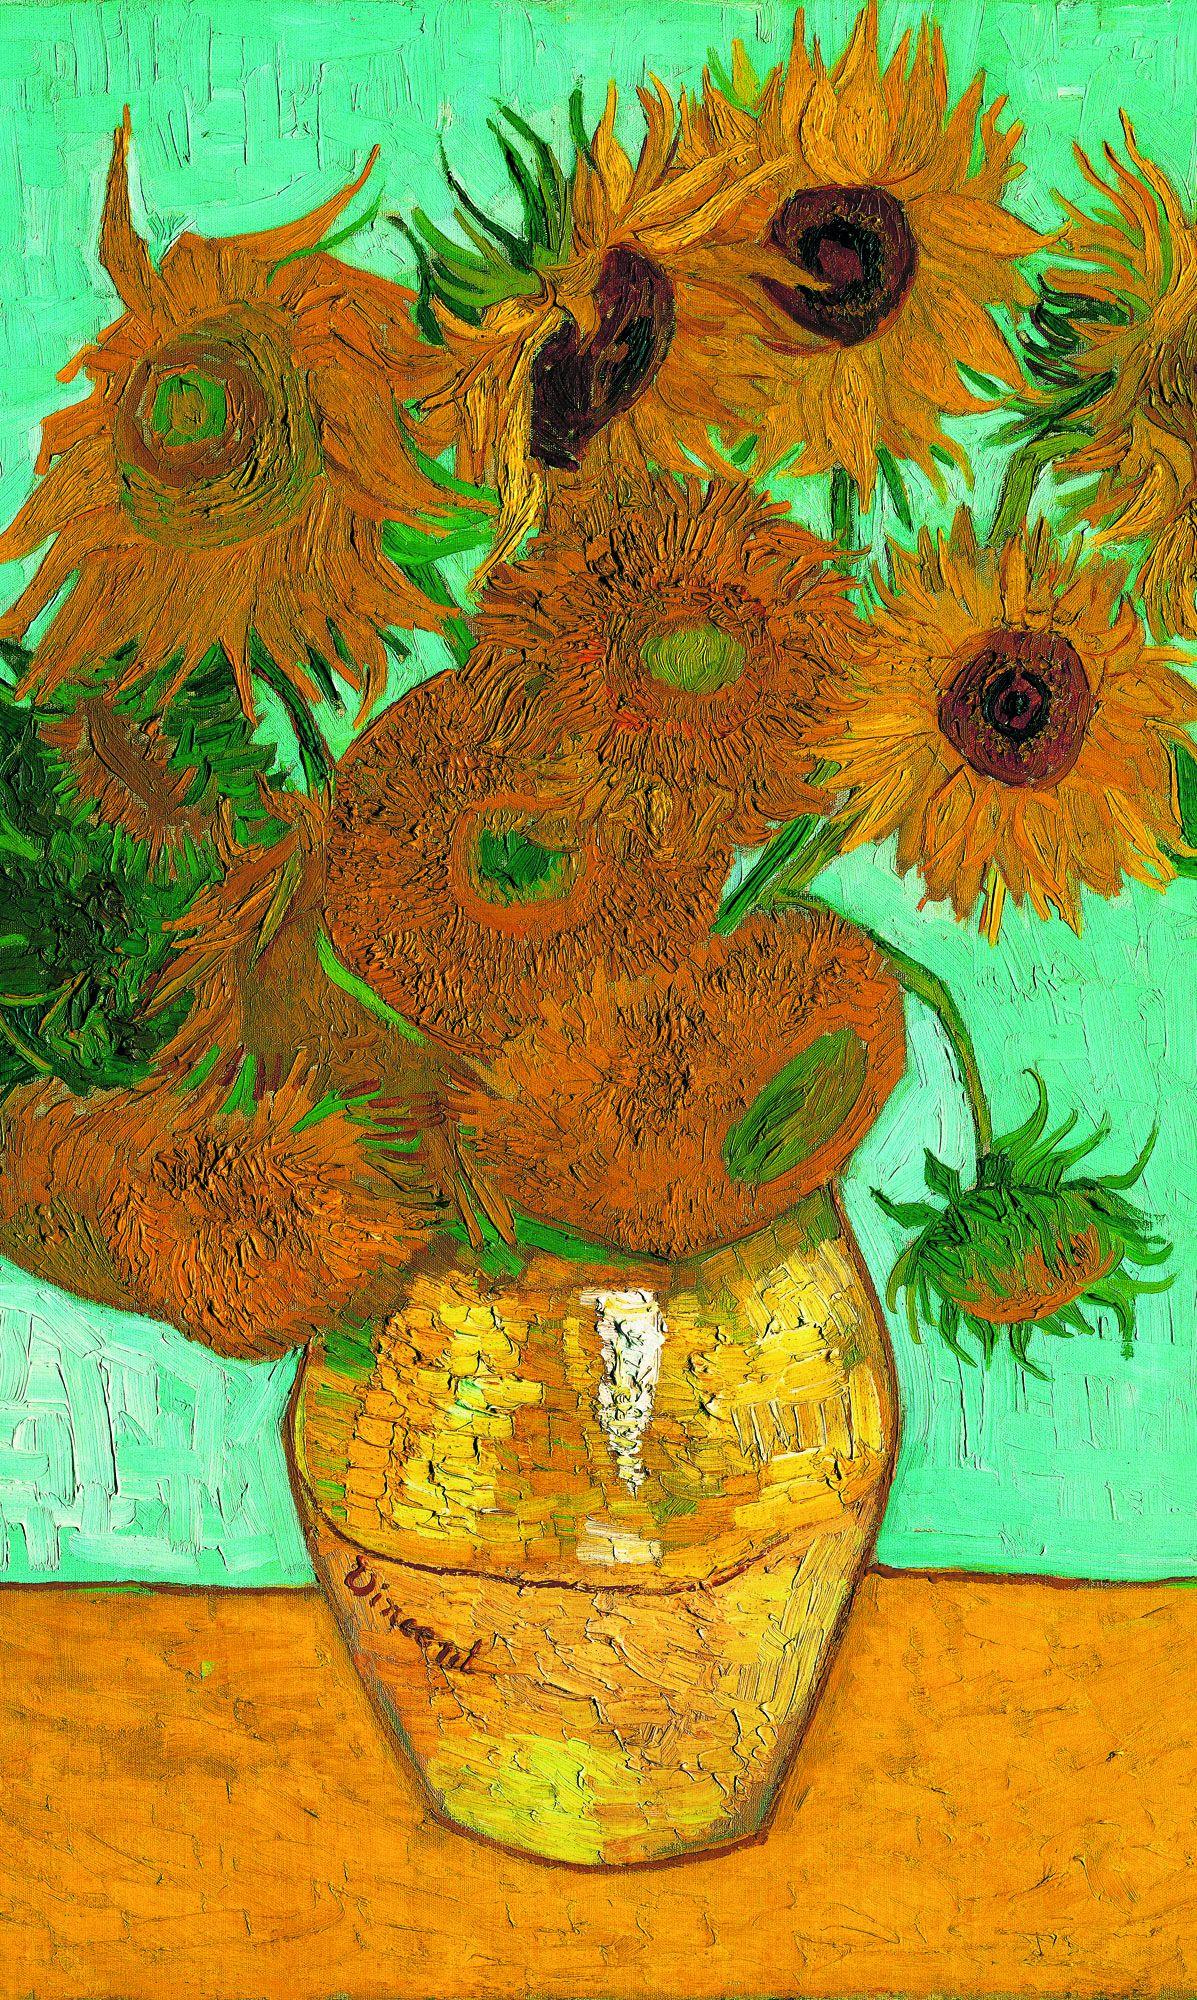 PIATNIK Puzzle 1000 Van Gogh